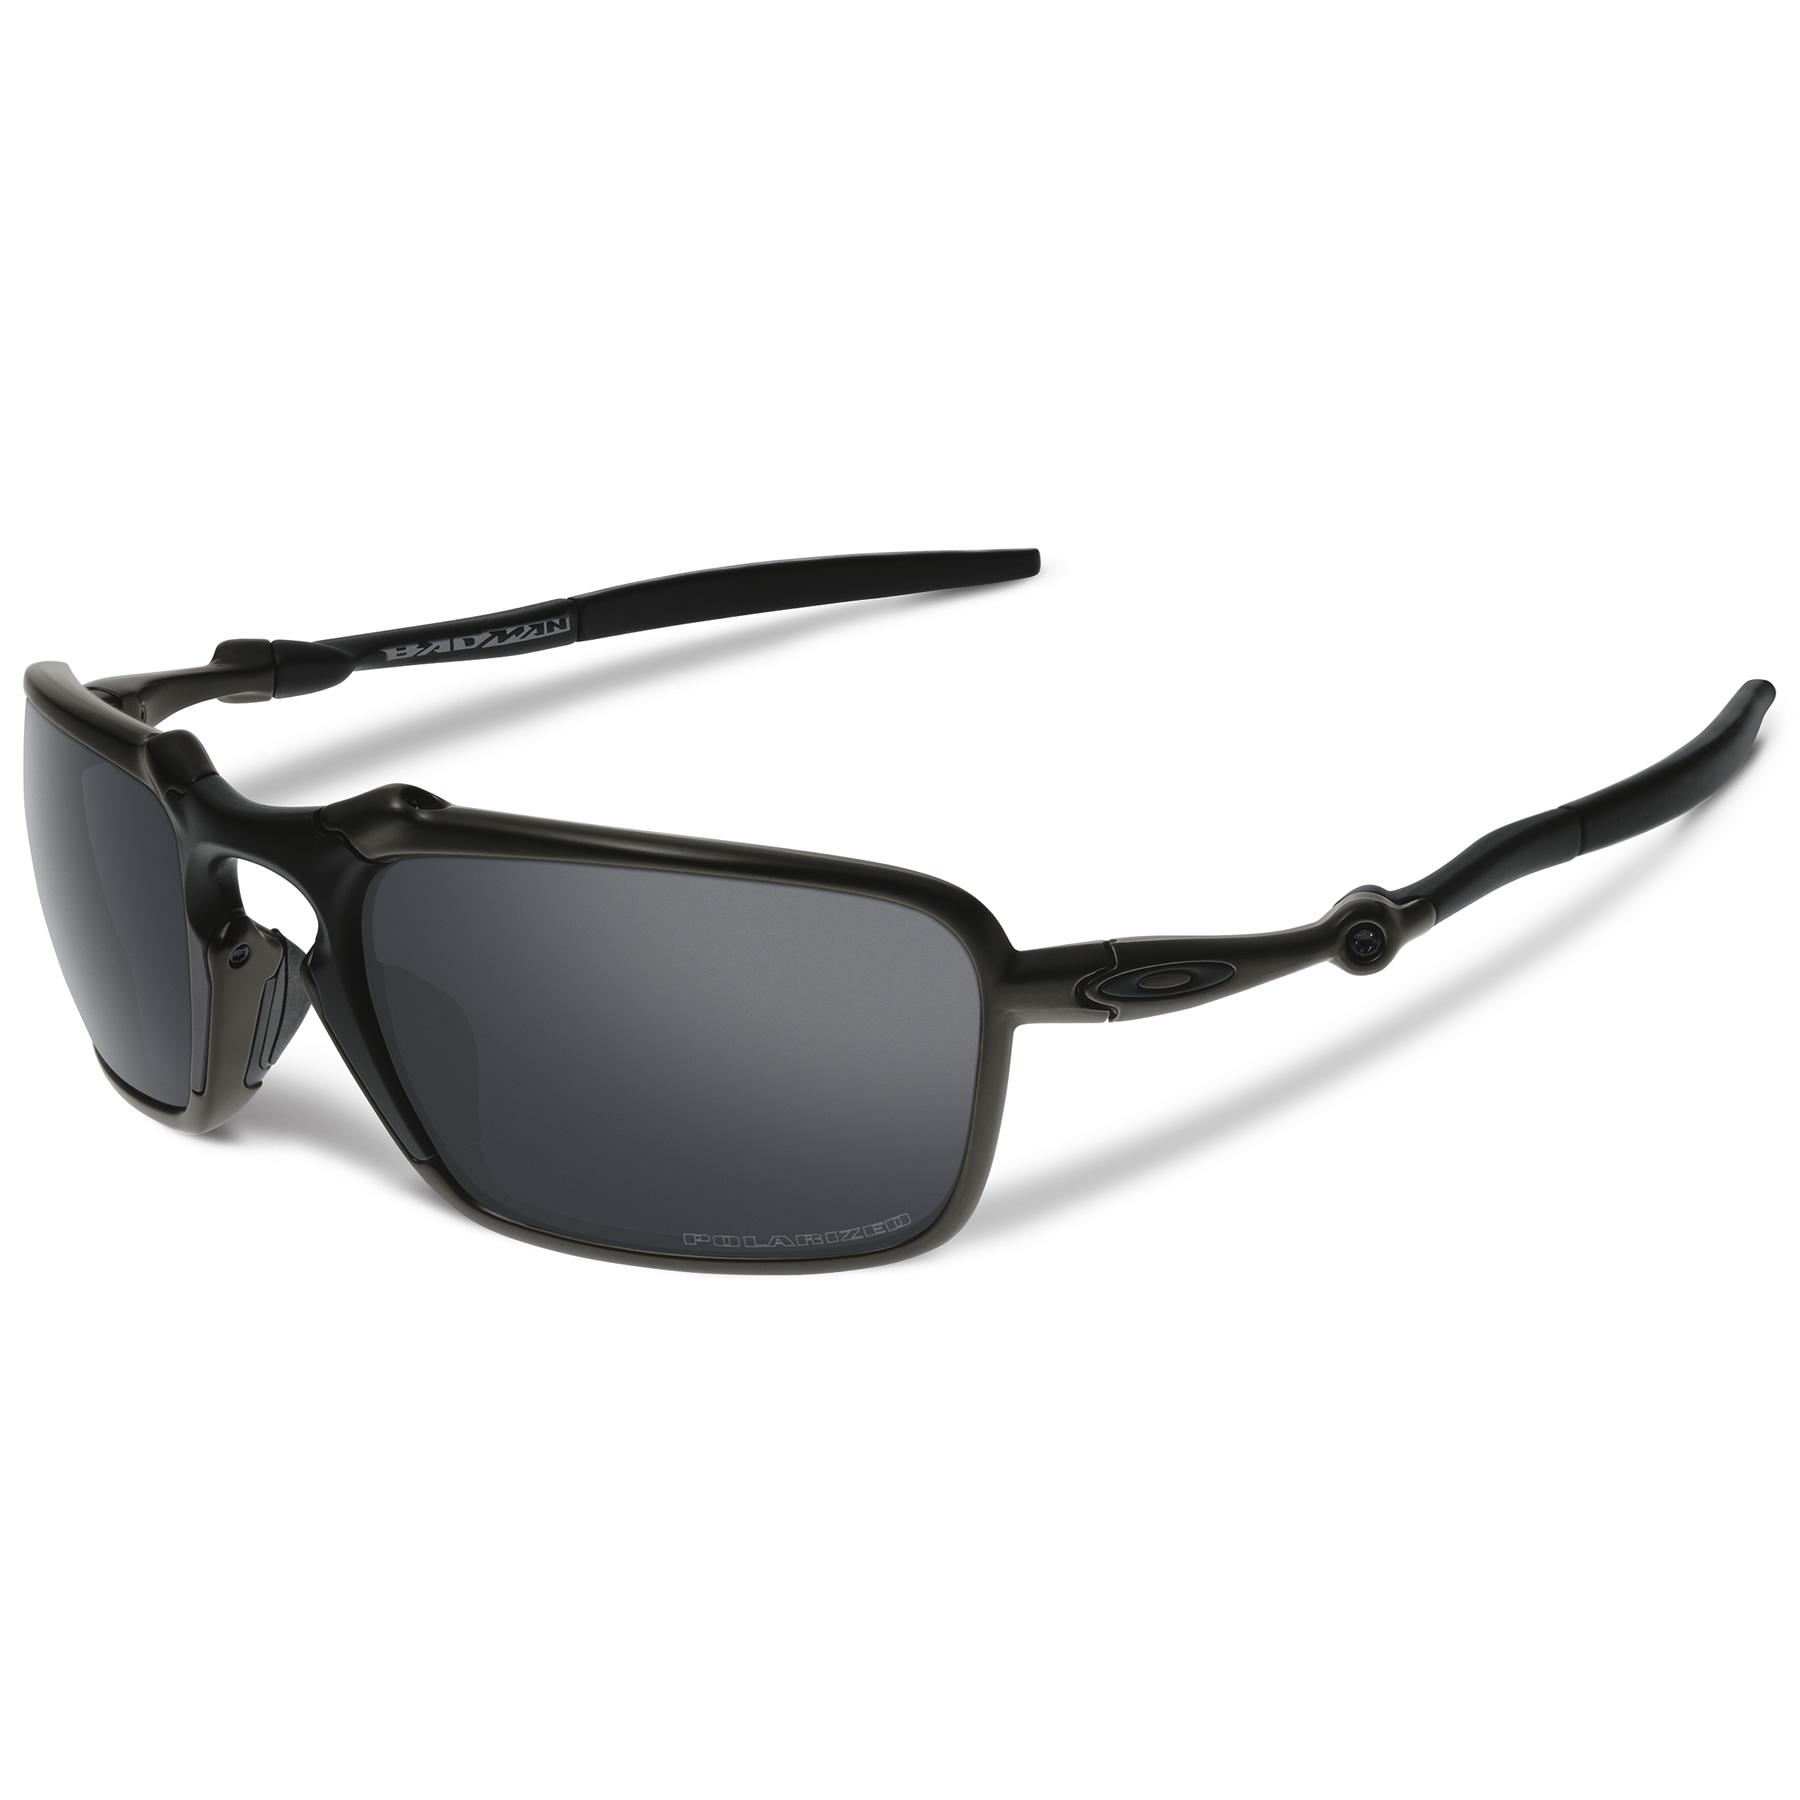 golf sunglasses oakley tacx  golf sunglasses oakley